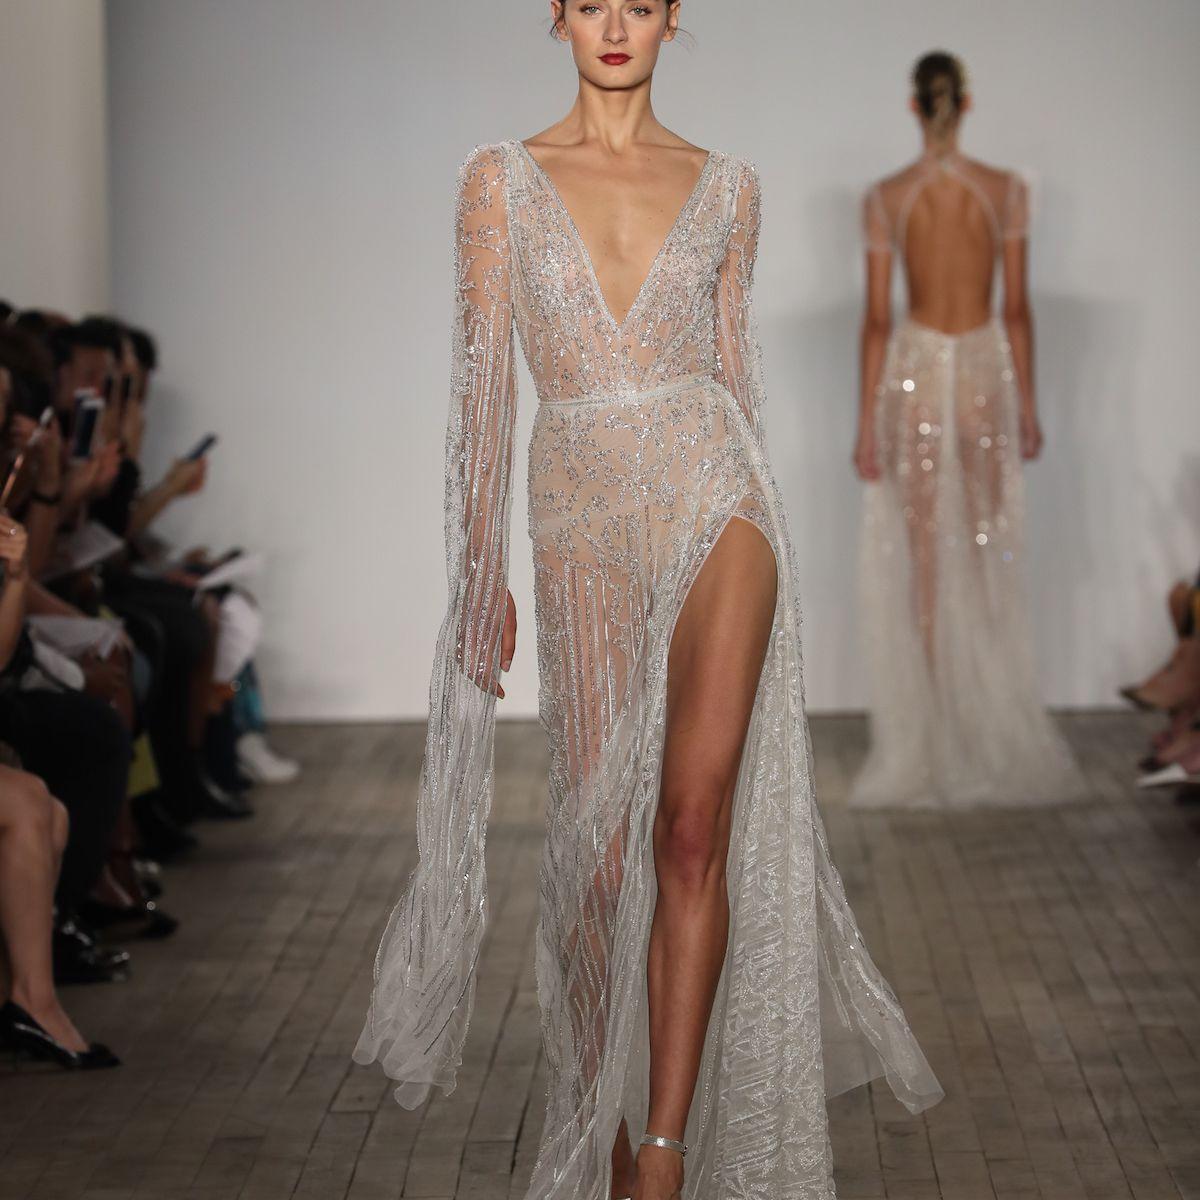 Model in long sleeve deep V-cut wedding dress